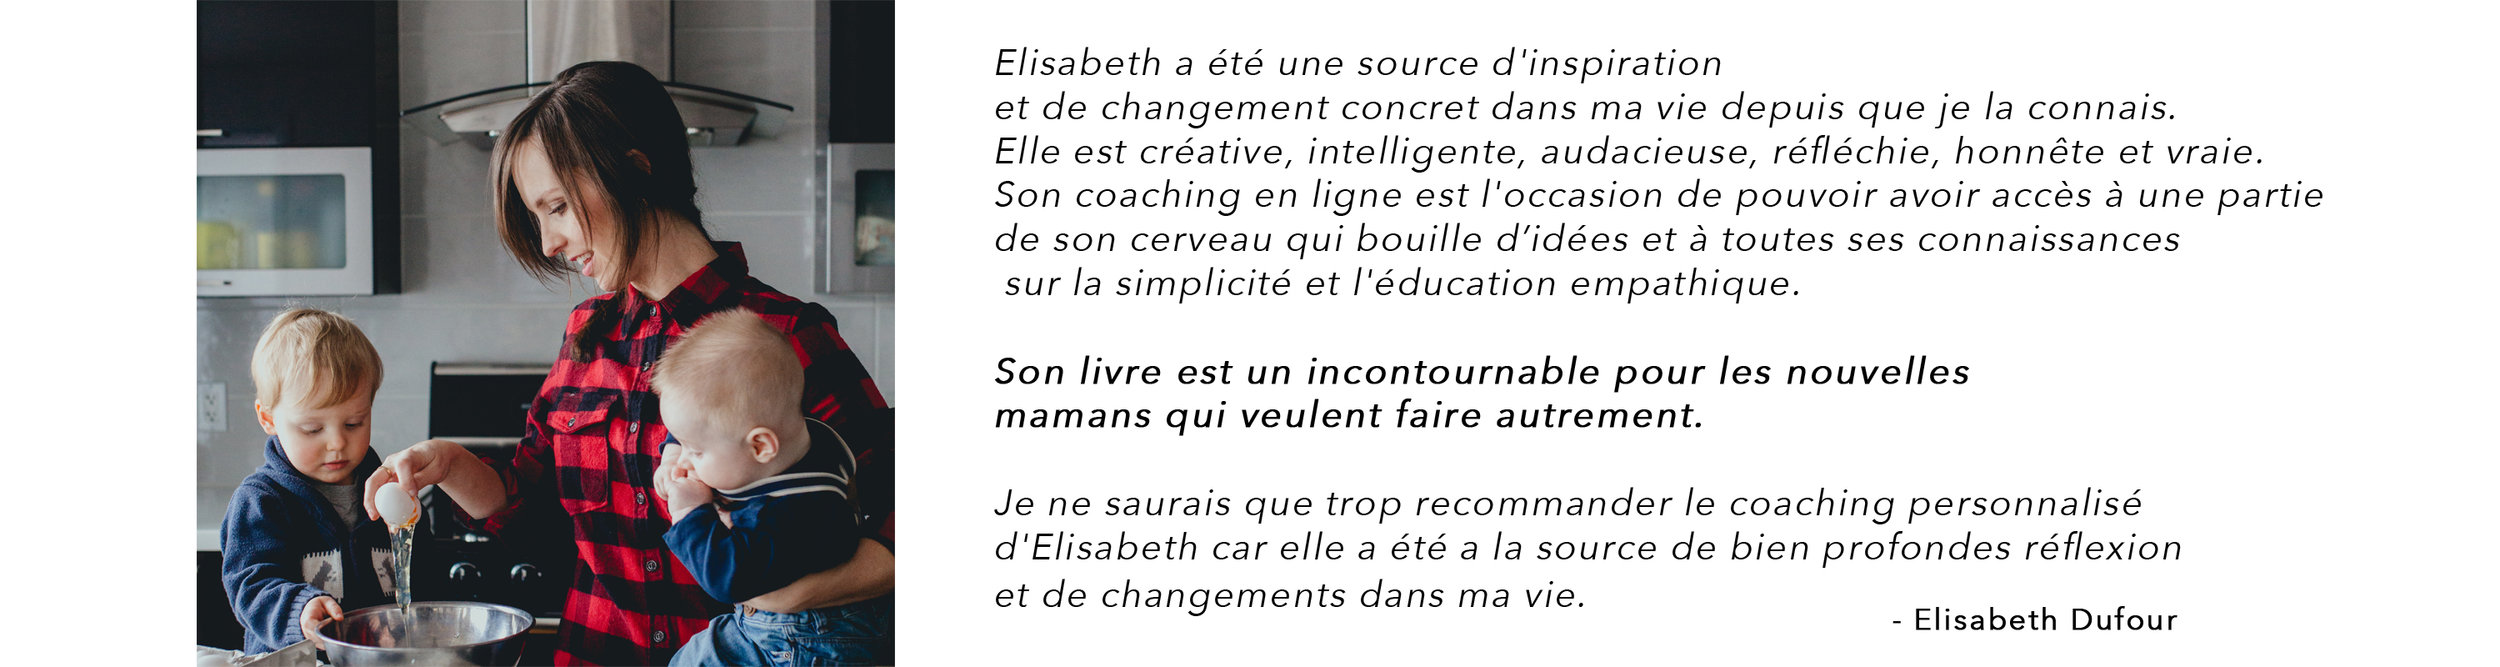 Eli Dufour review.jpg